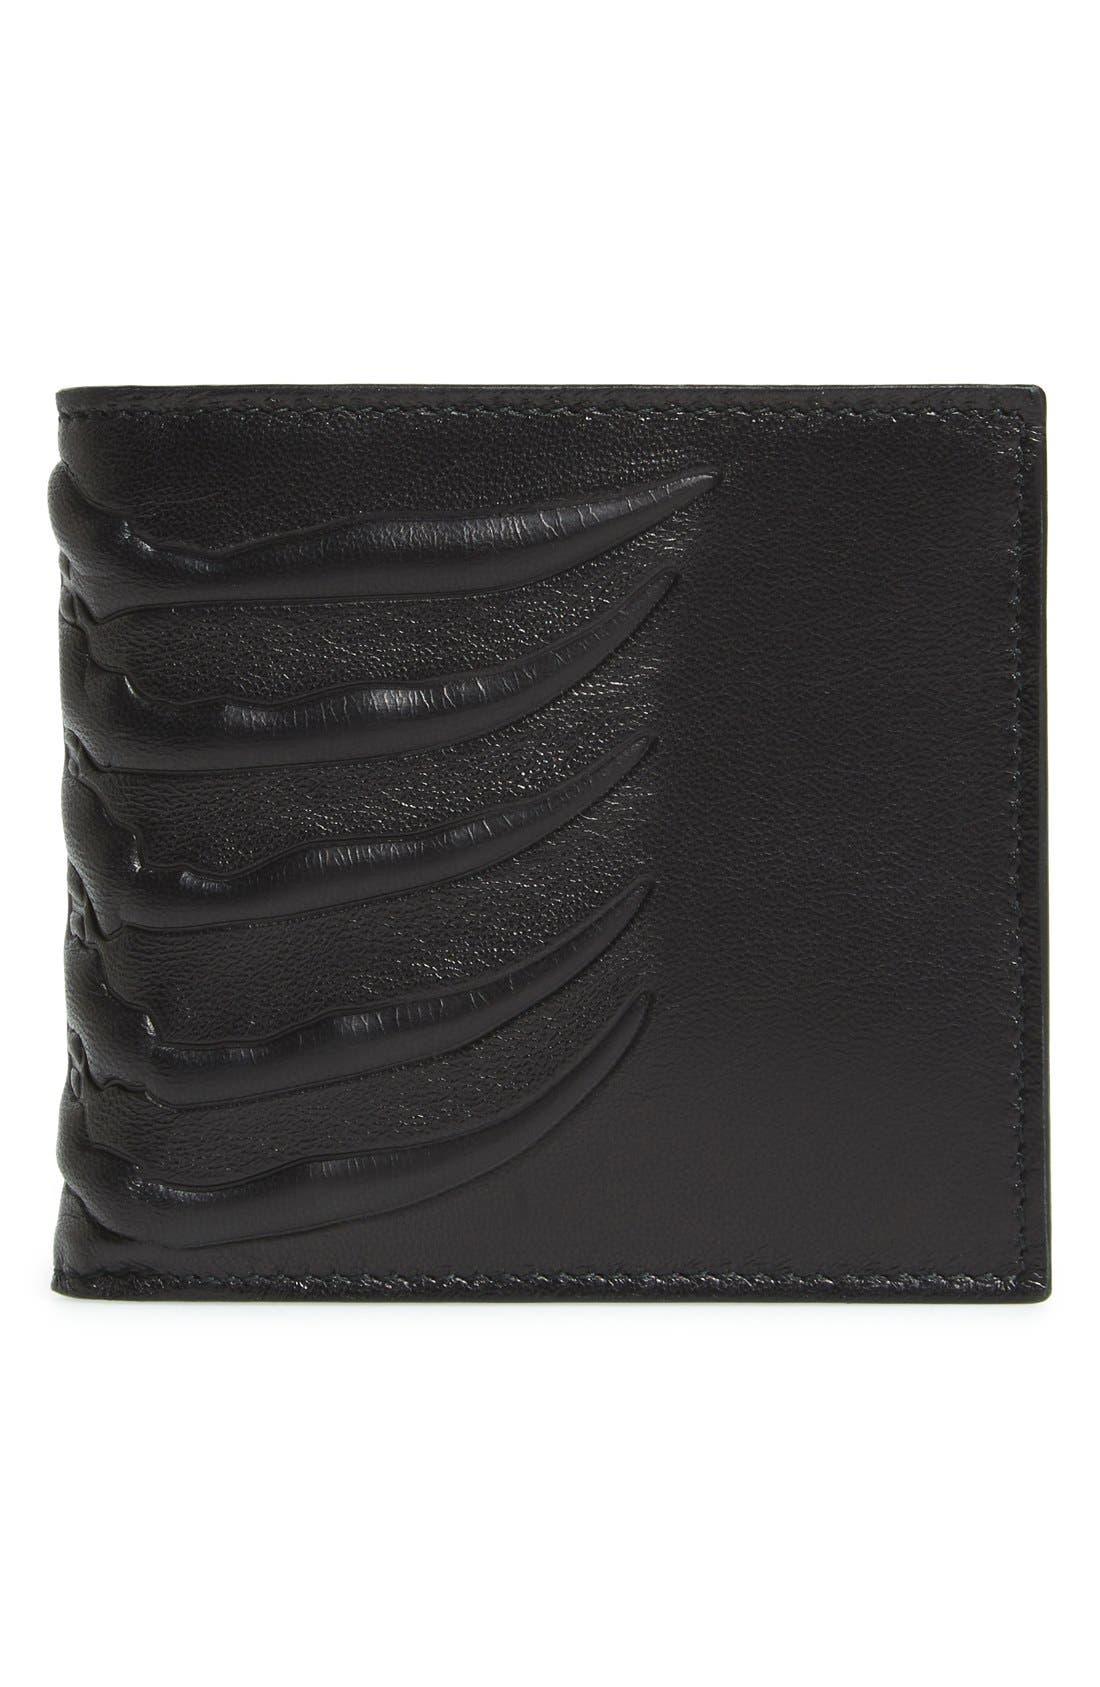 Rib Cage Leather Wallet,                             Main thumbnail 1, color,                             BLACK